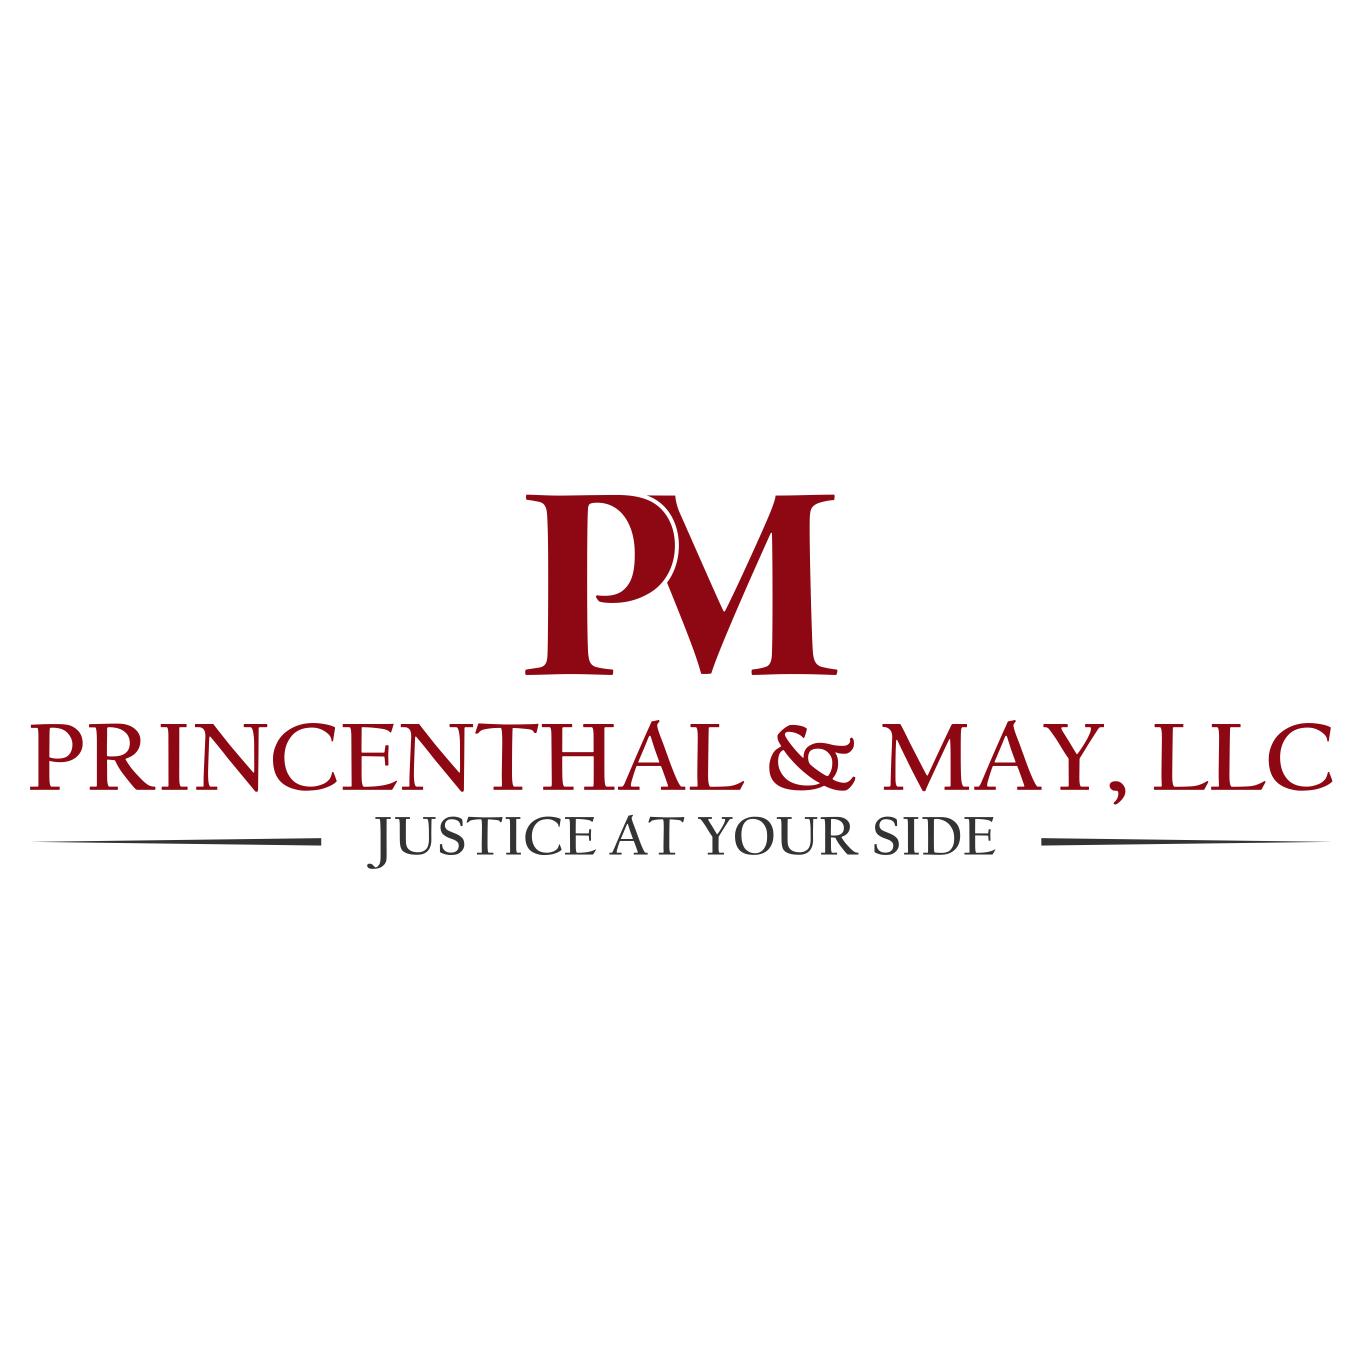 Princenthal & May, LLC